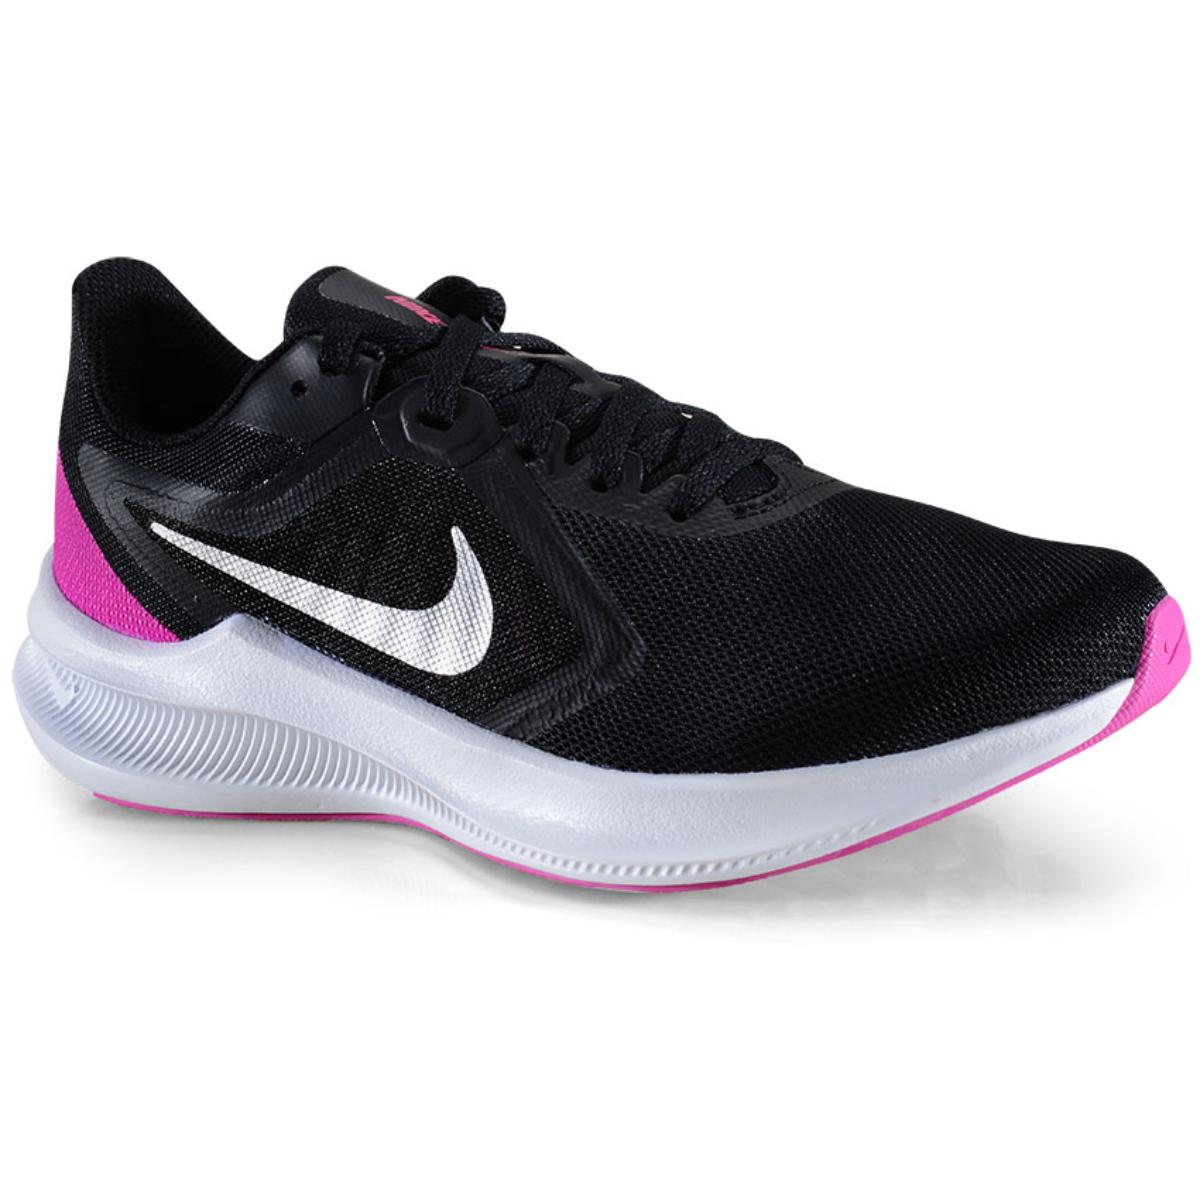 Tênis Feminino Nike Ci9984-004 Downshifter 10 Preto/branco/pink